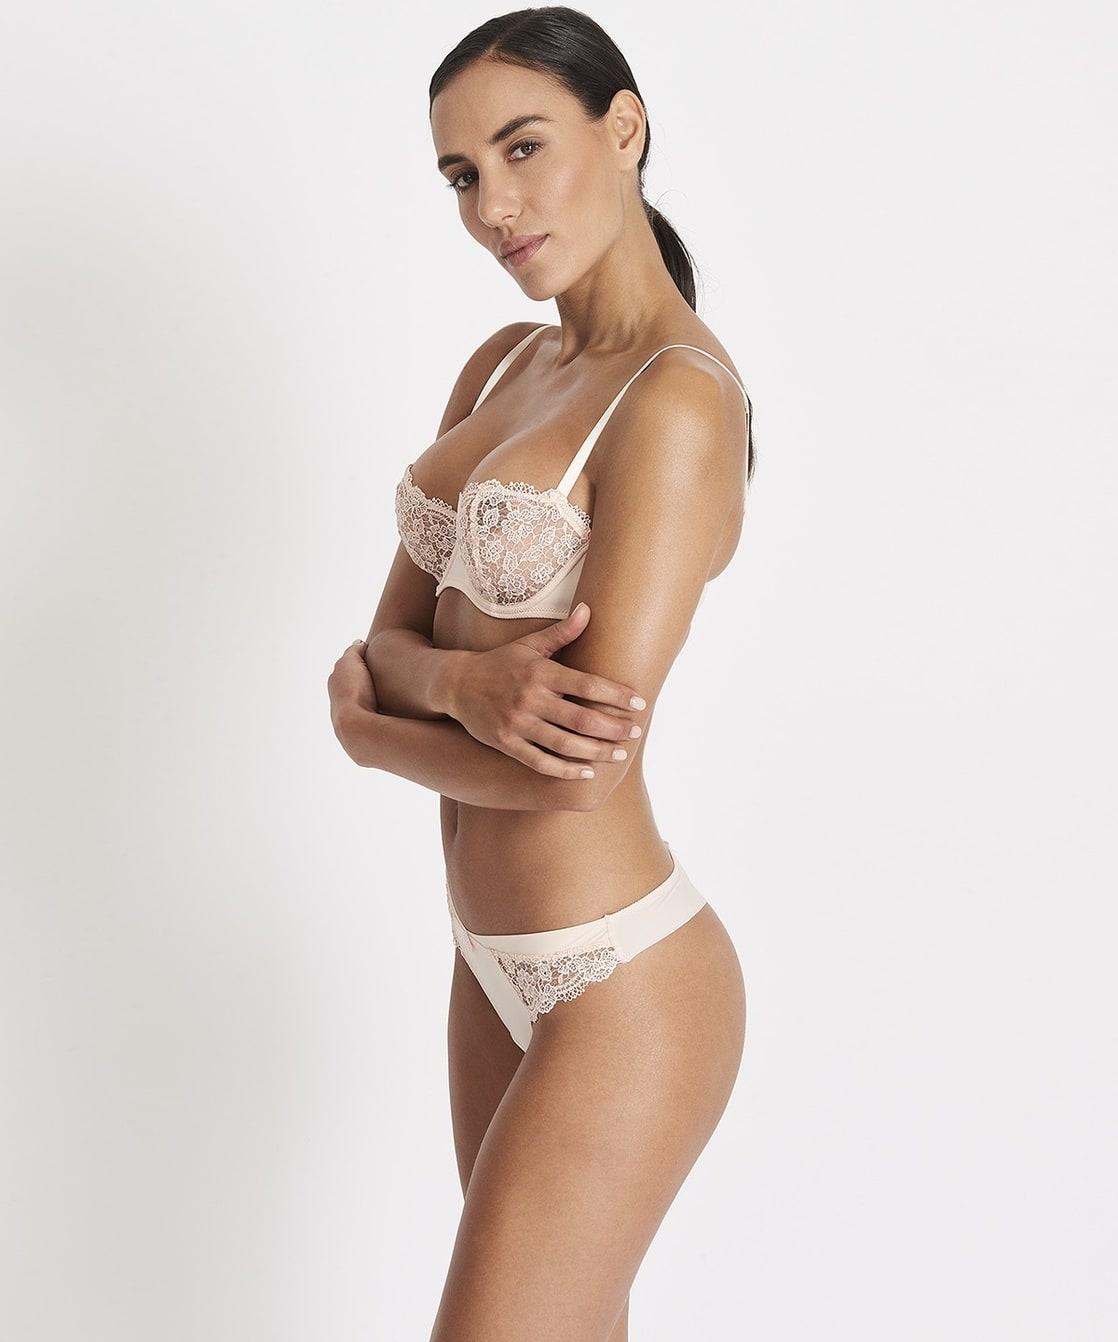 Bikini Elisa Meliani naked (29 photo), Ass, Paparazzi, Feet, underwear 2020